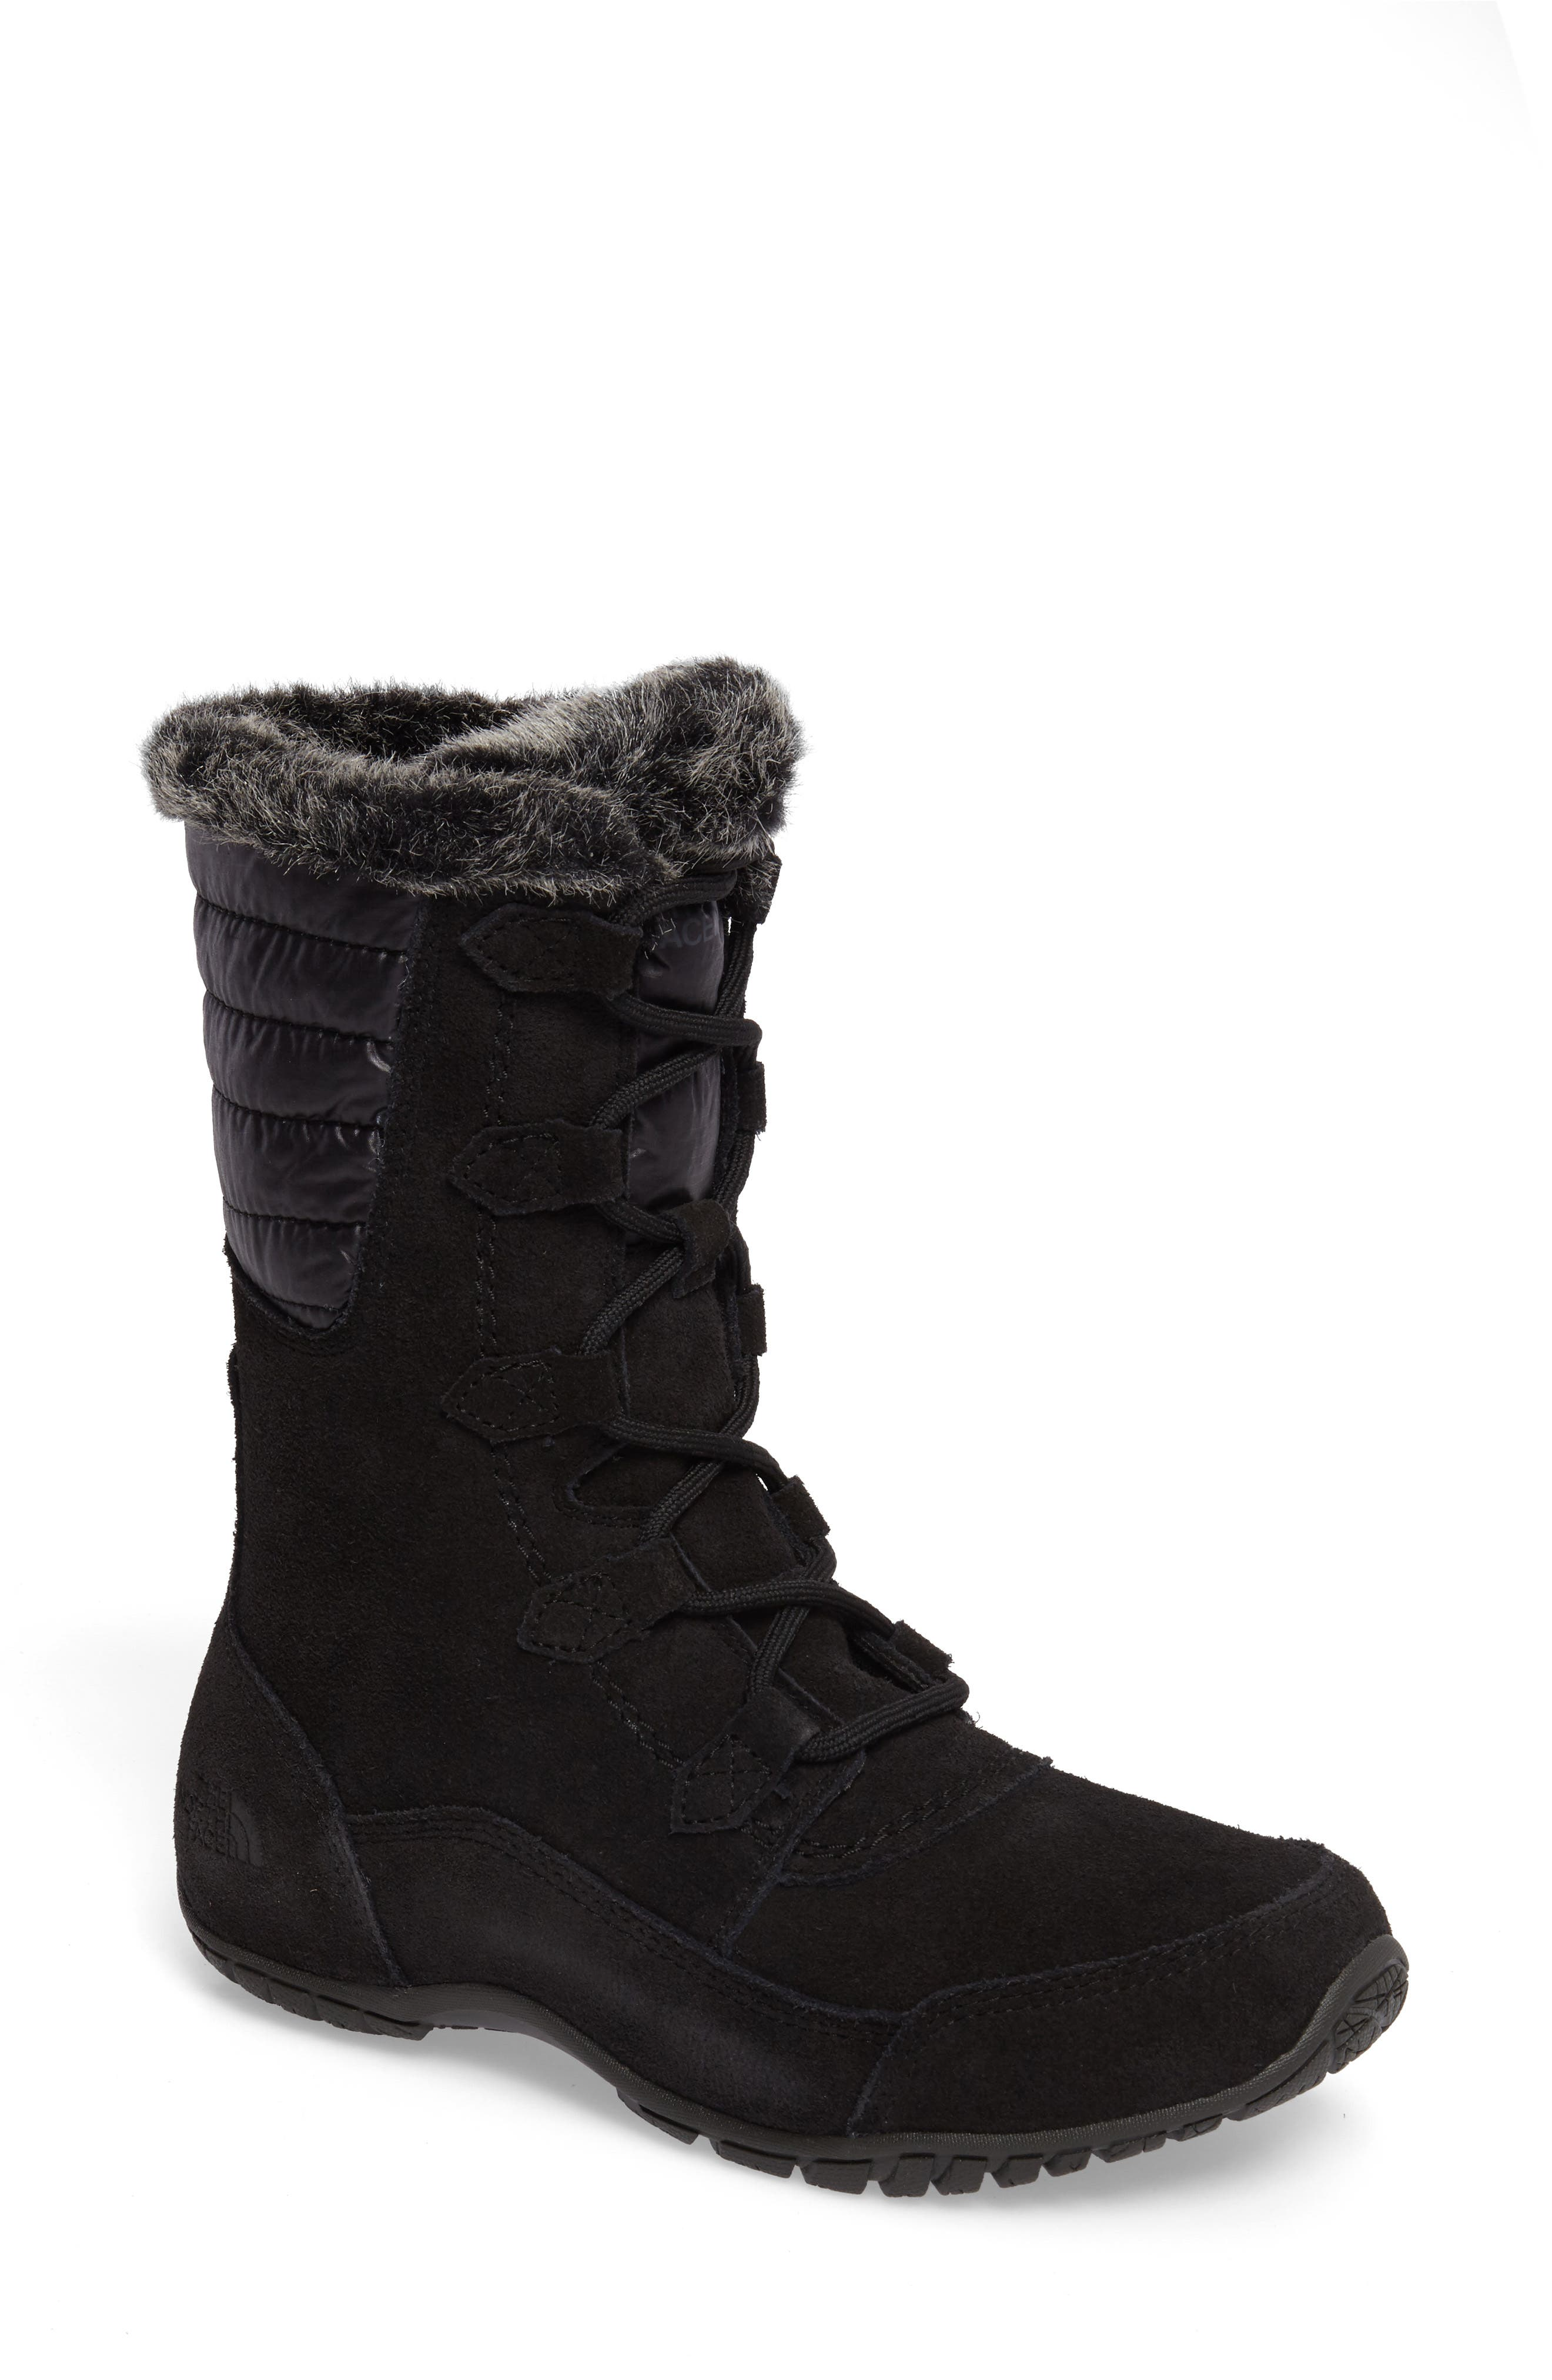 Nuptse Purna II Waterproof PrimaLoft<sup>®</sup> Silver Eco Insulated Winter Boot,                             Main thumbnail 1, color,                             Tnf Black/ Beluga Grey